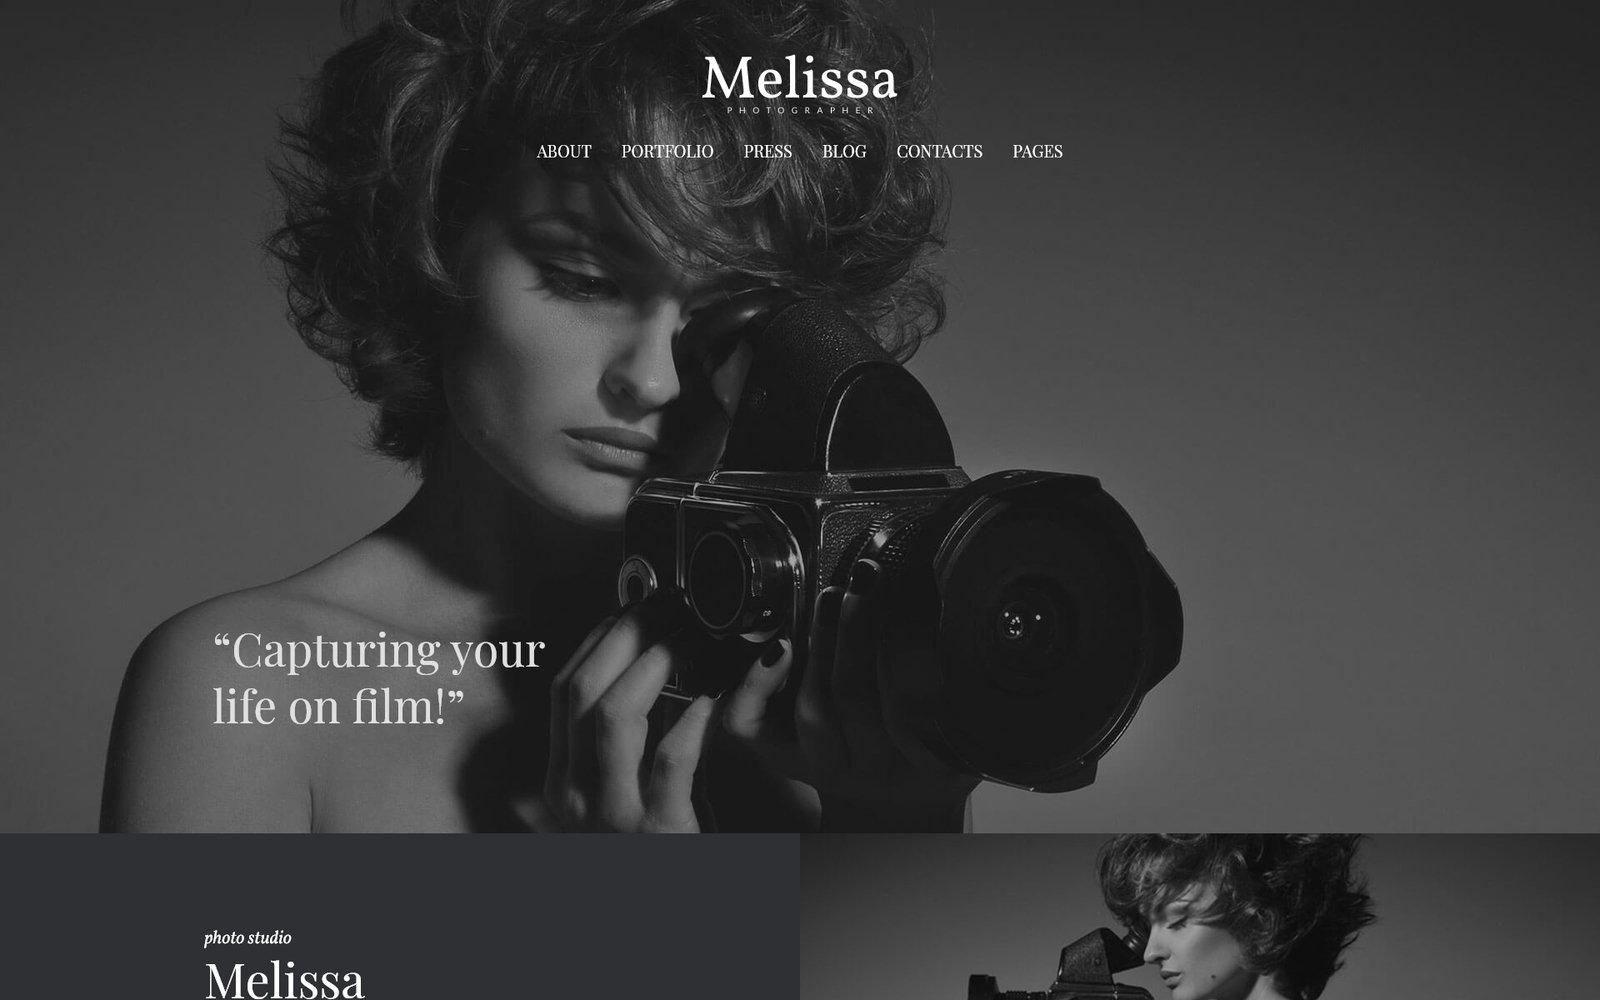 Melissa - адаптивная WordPress тема для портфолио фотографа №52153 - скриншот